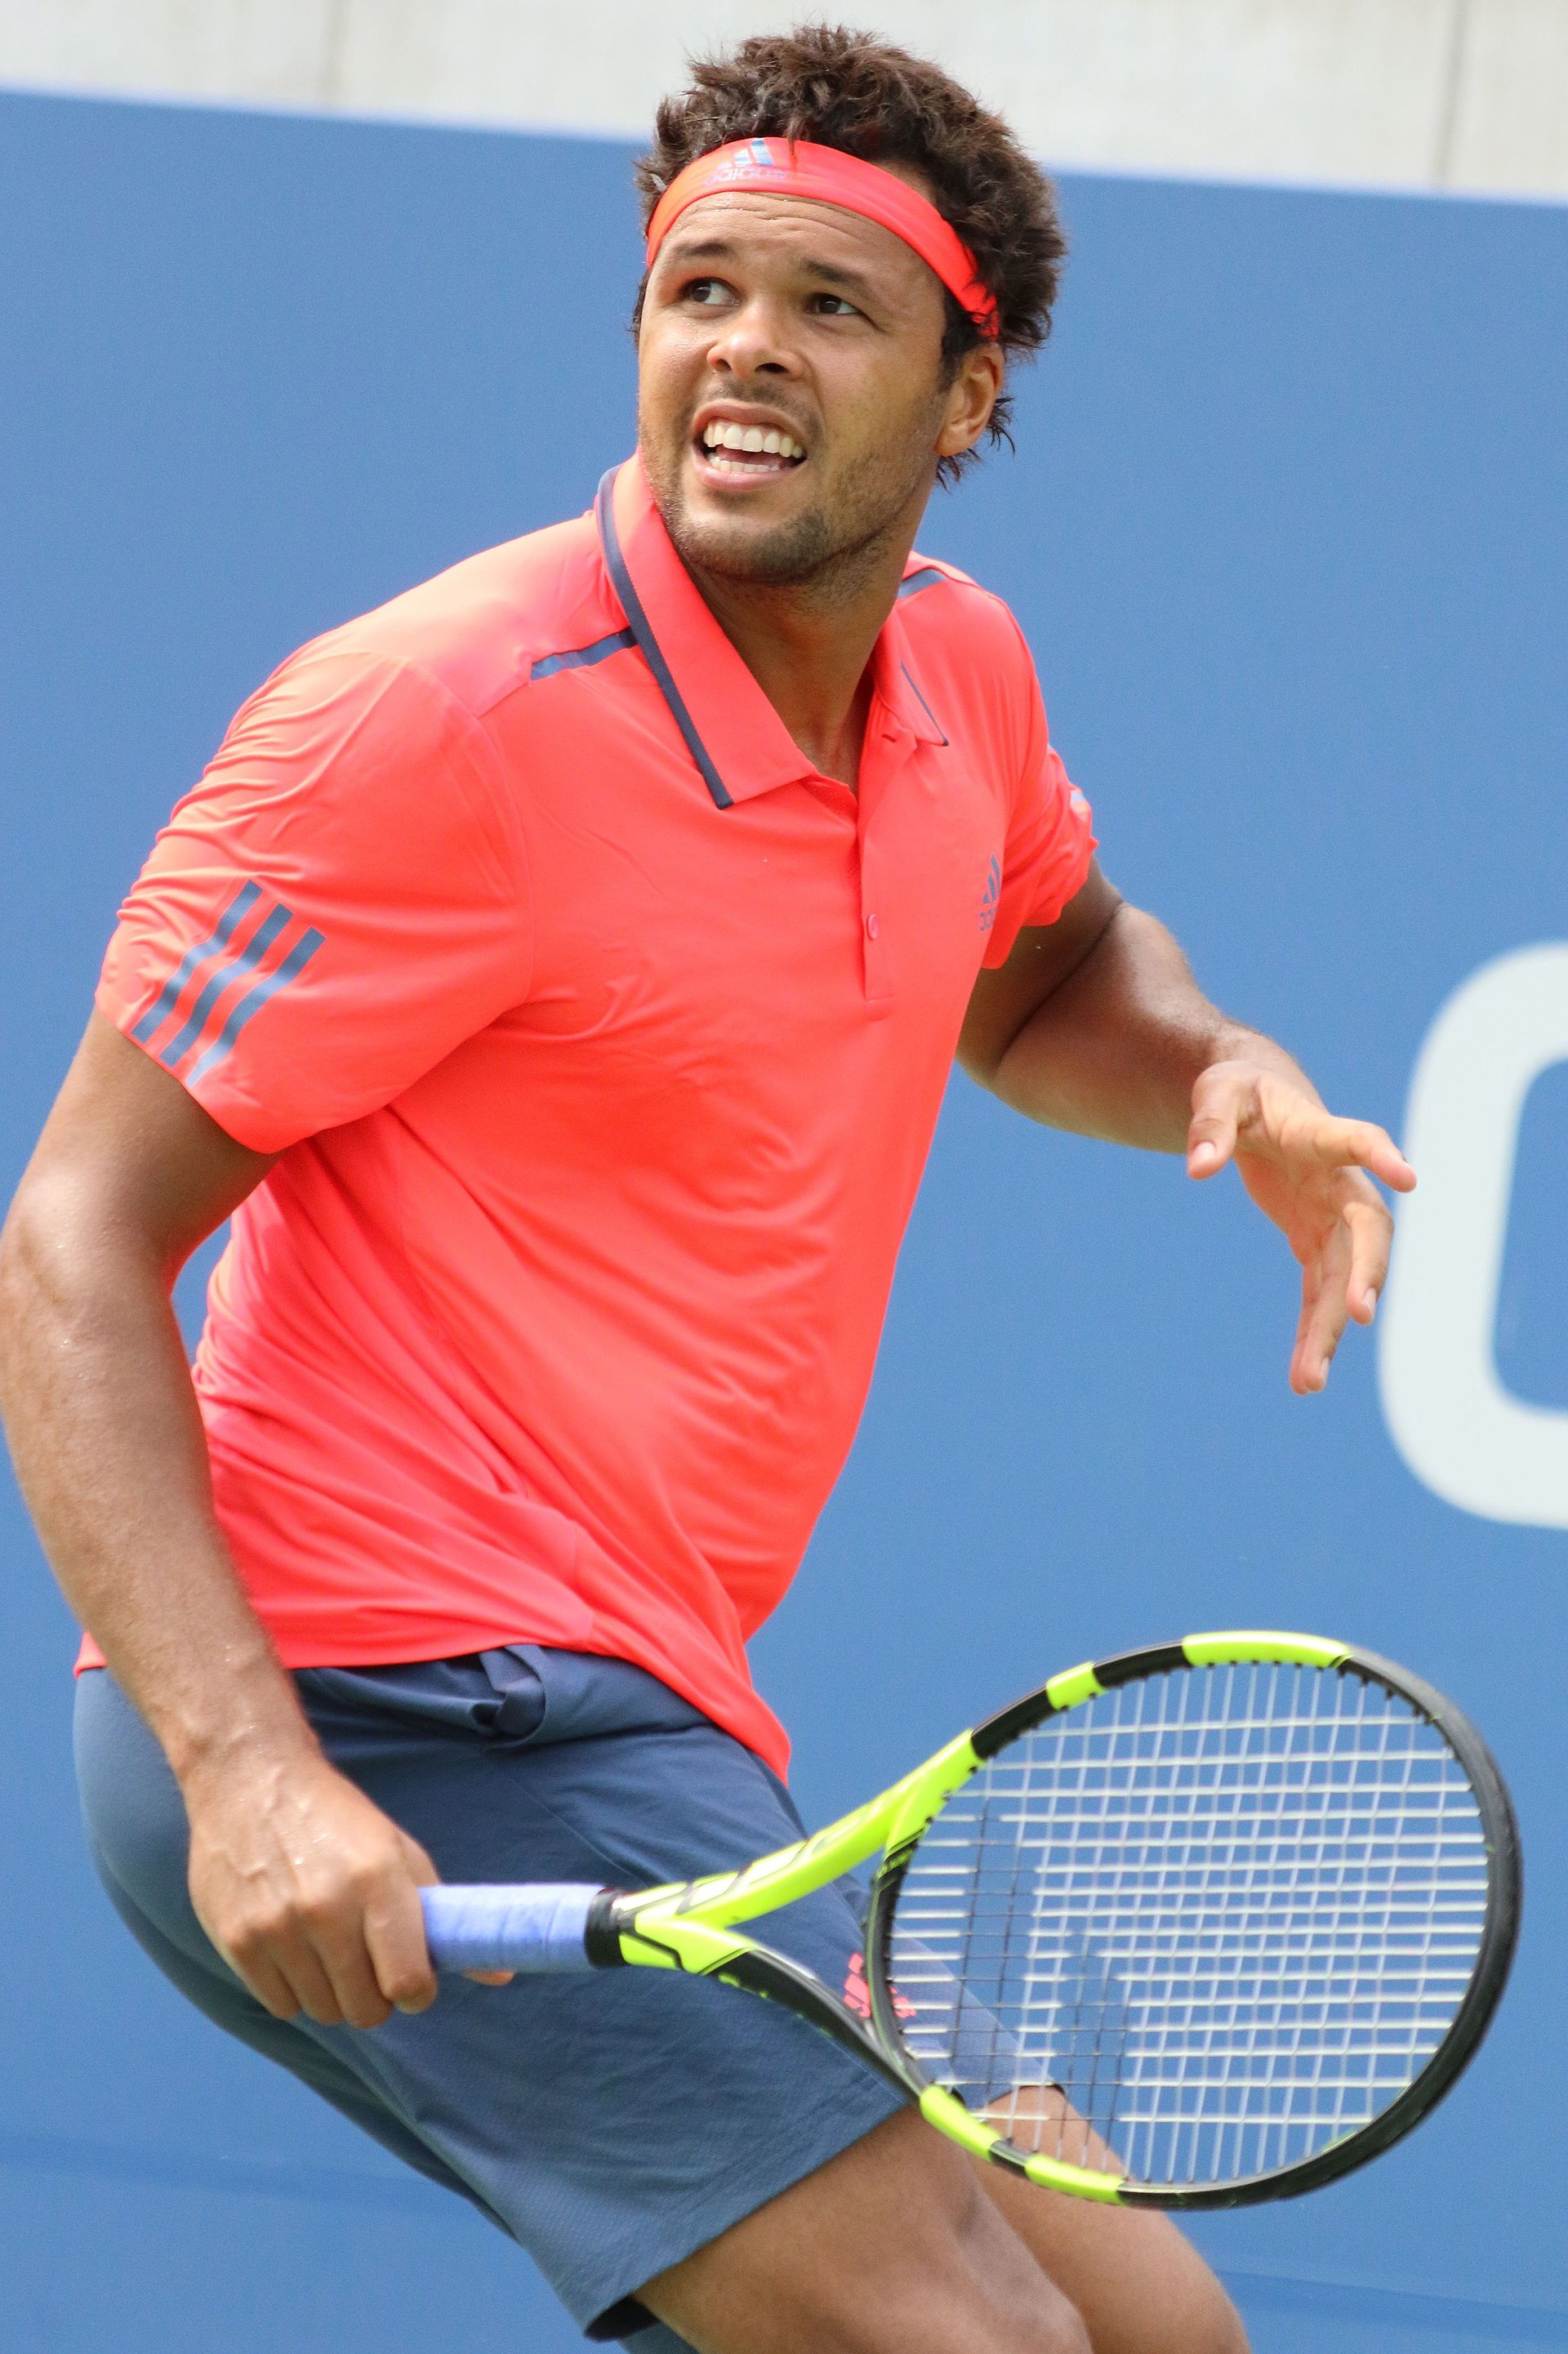 prise de raquette au tennis